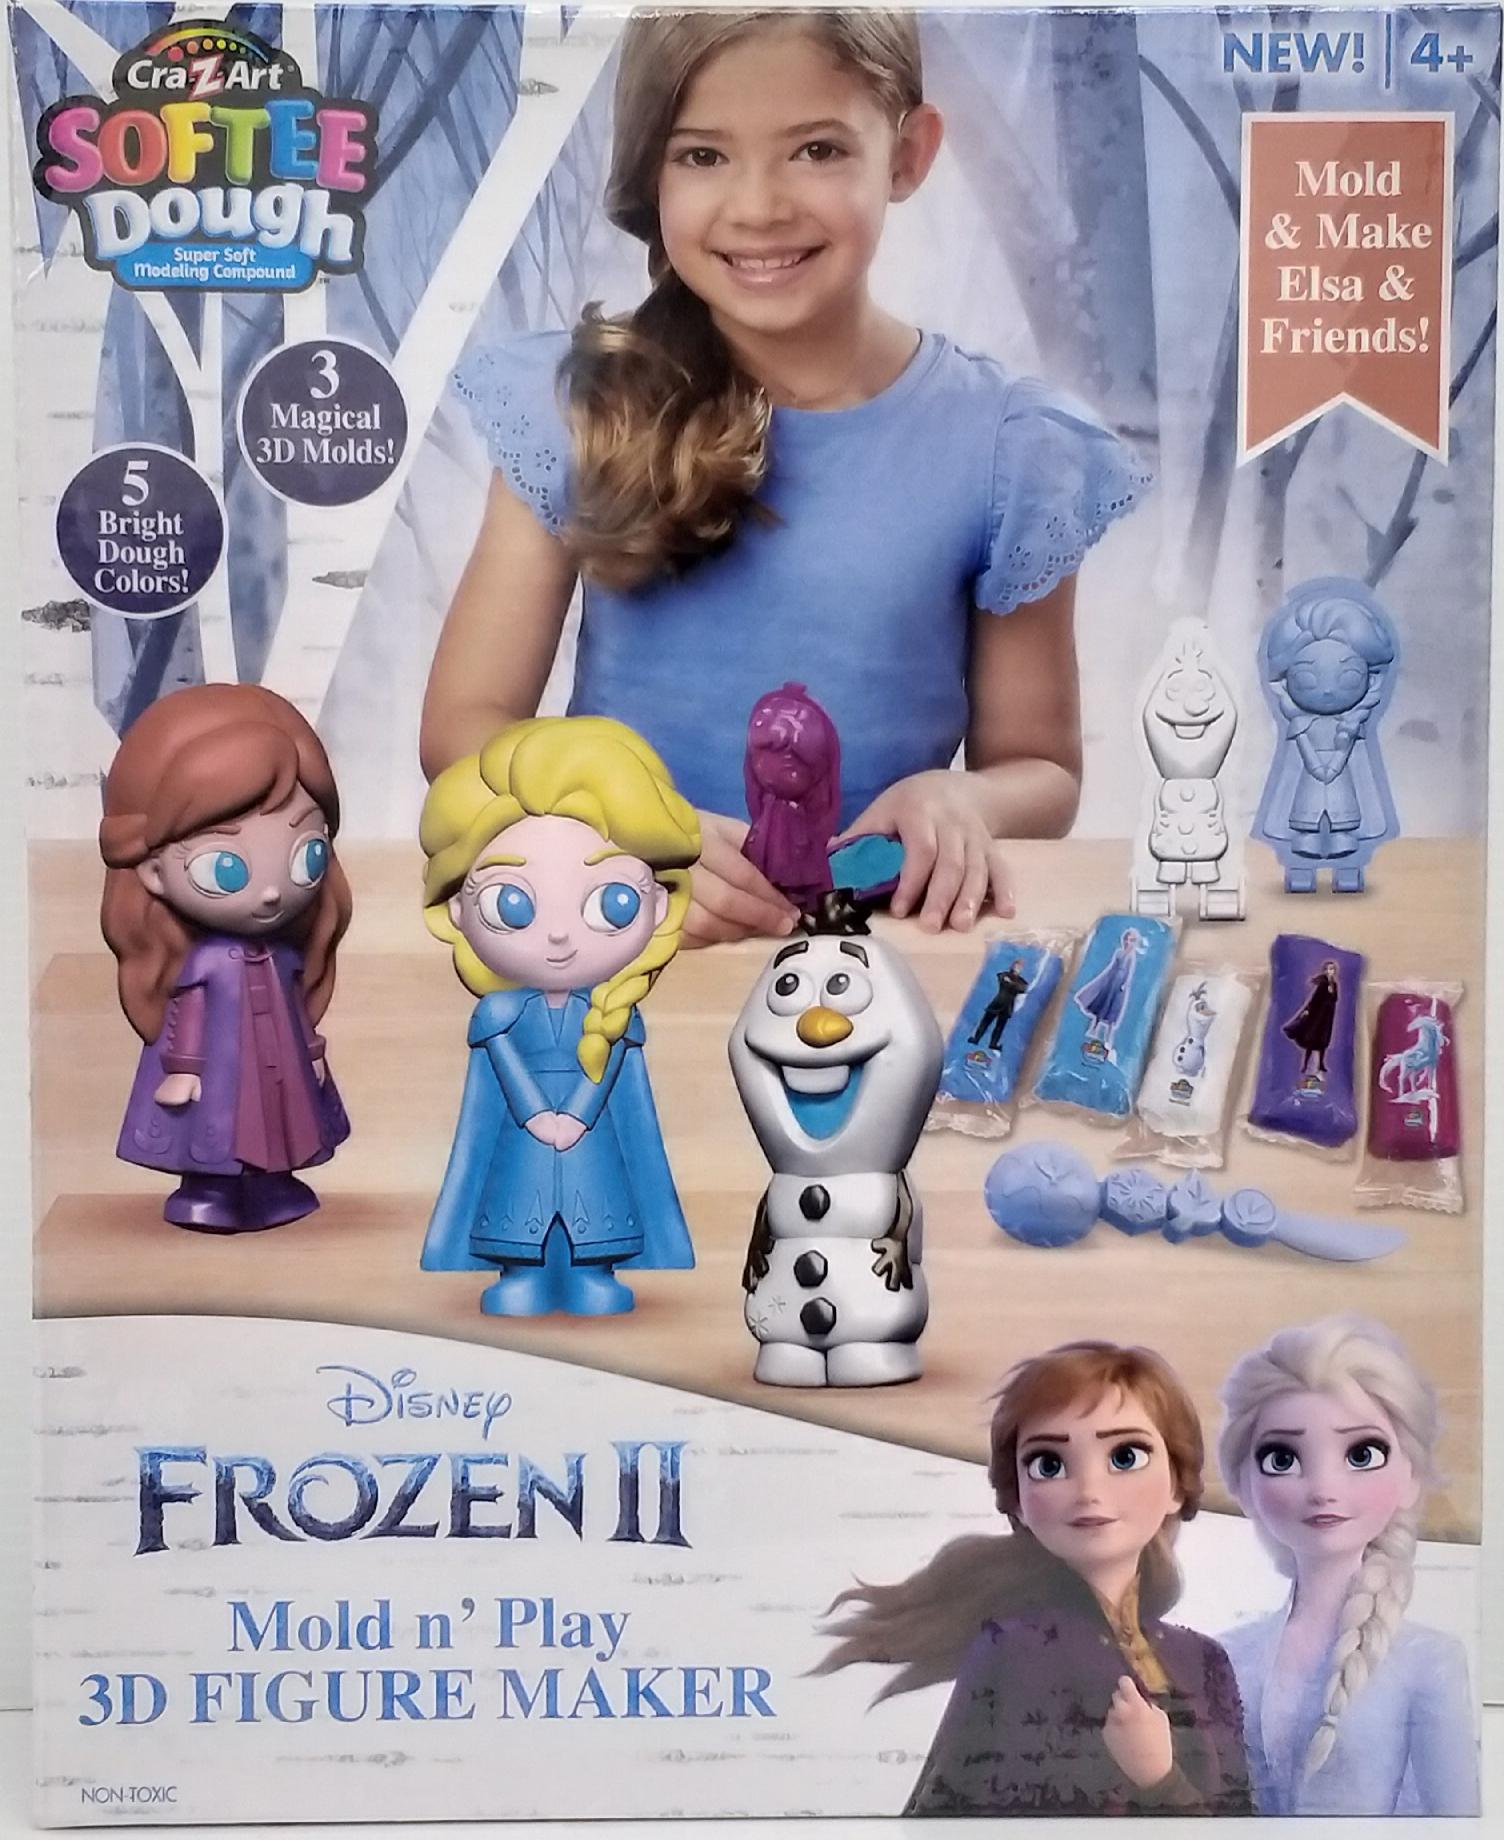 Disney Frozen II Softee Dough Mold n Play 3D Figur